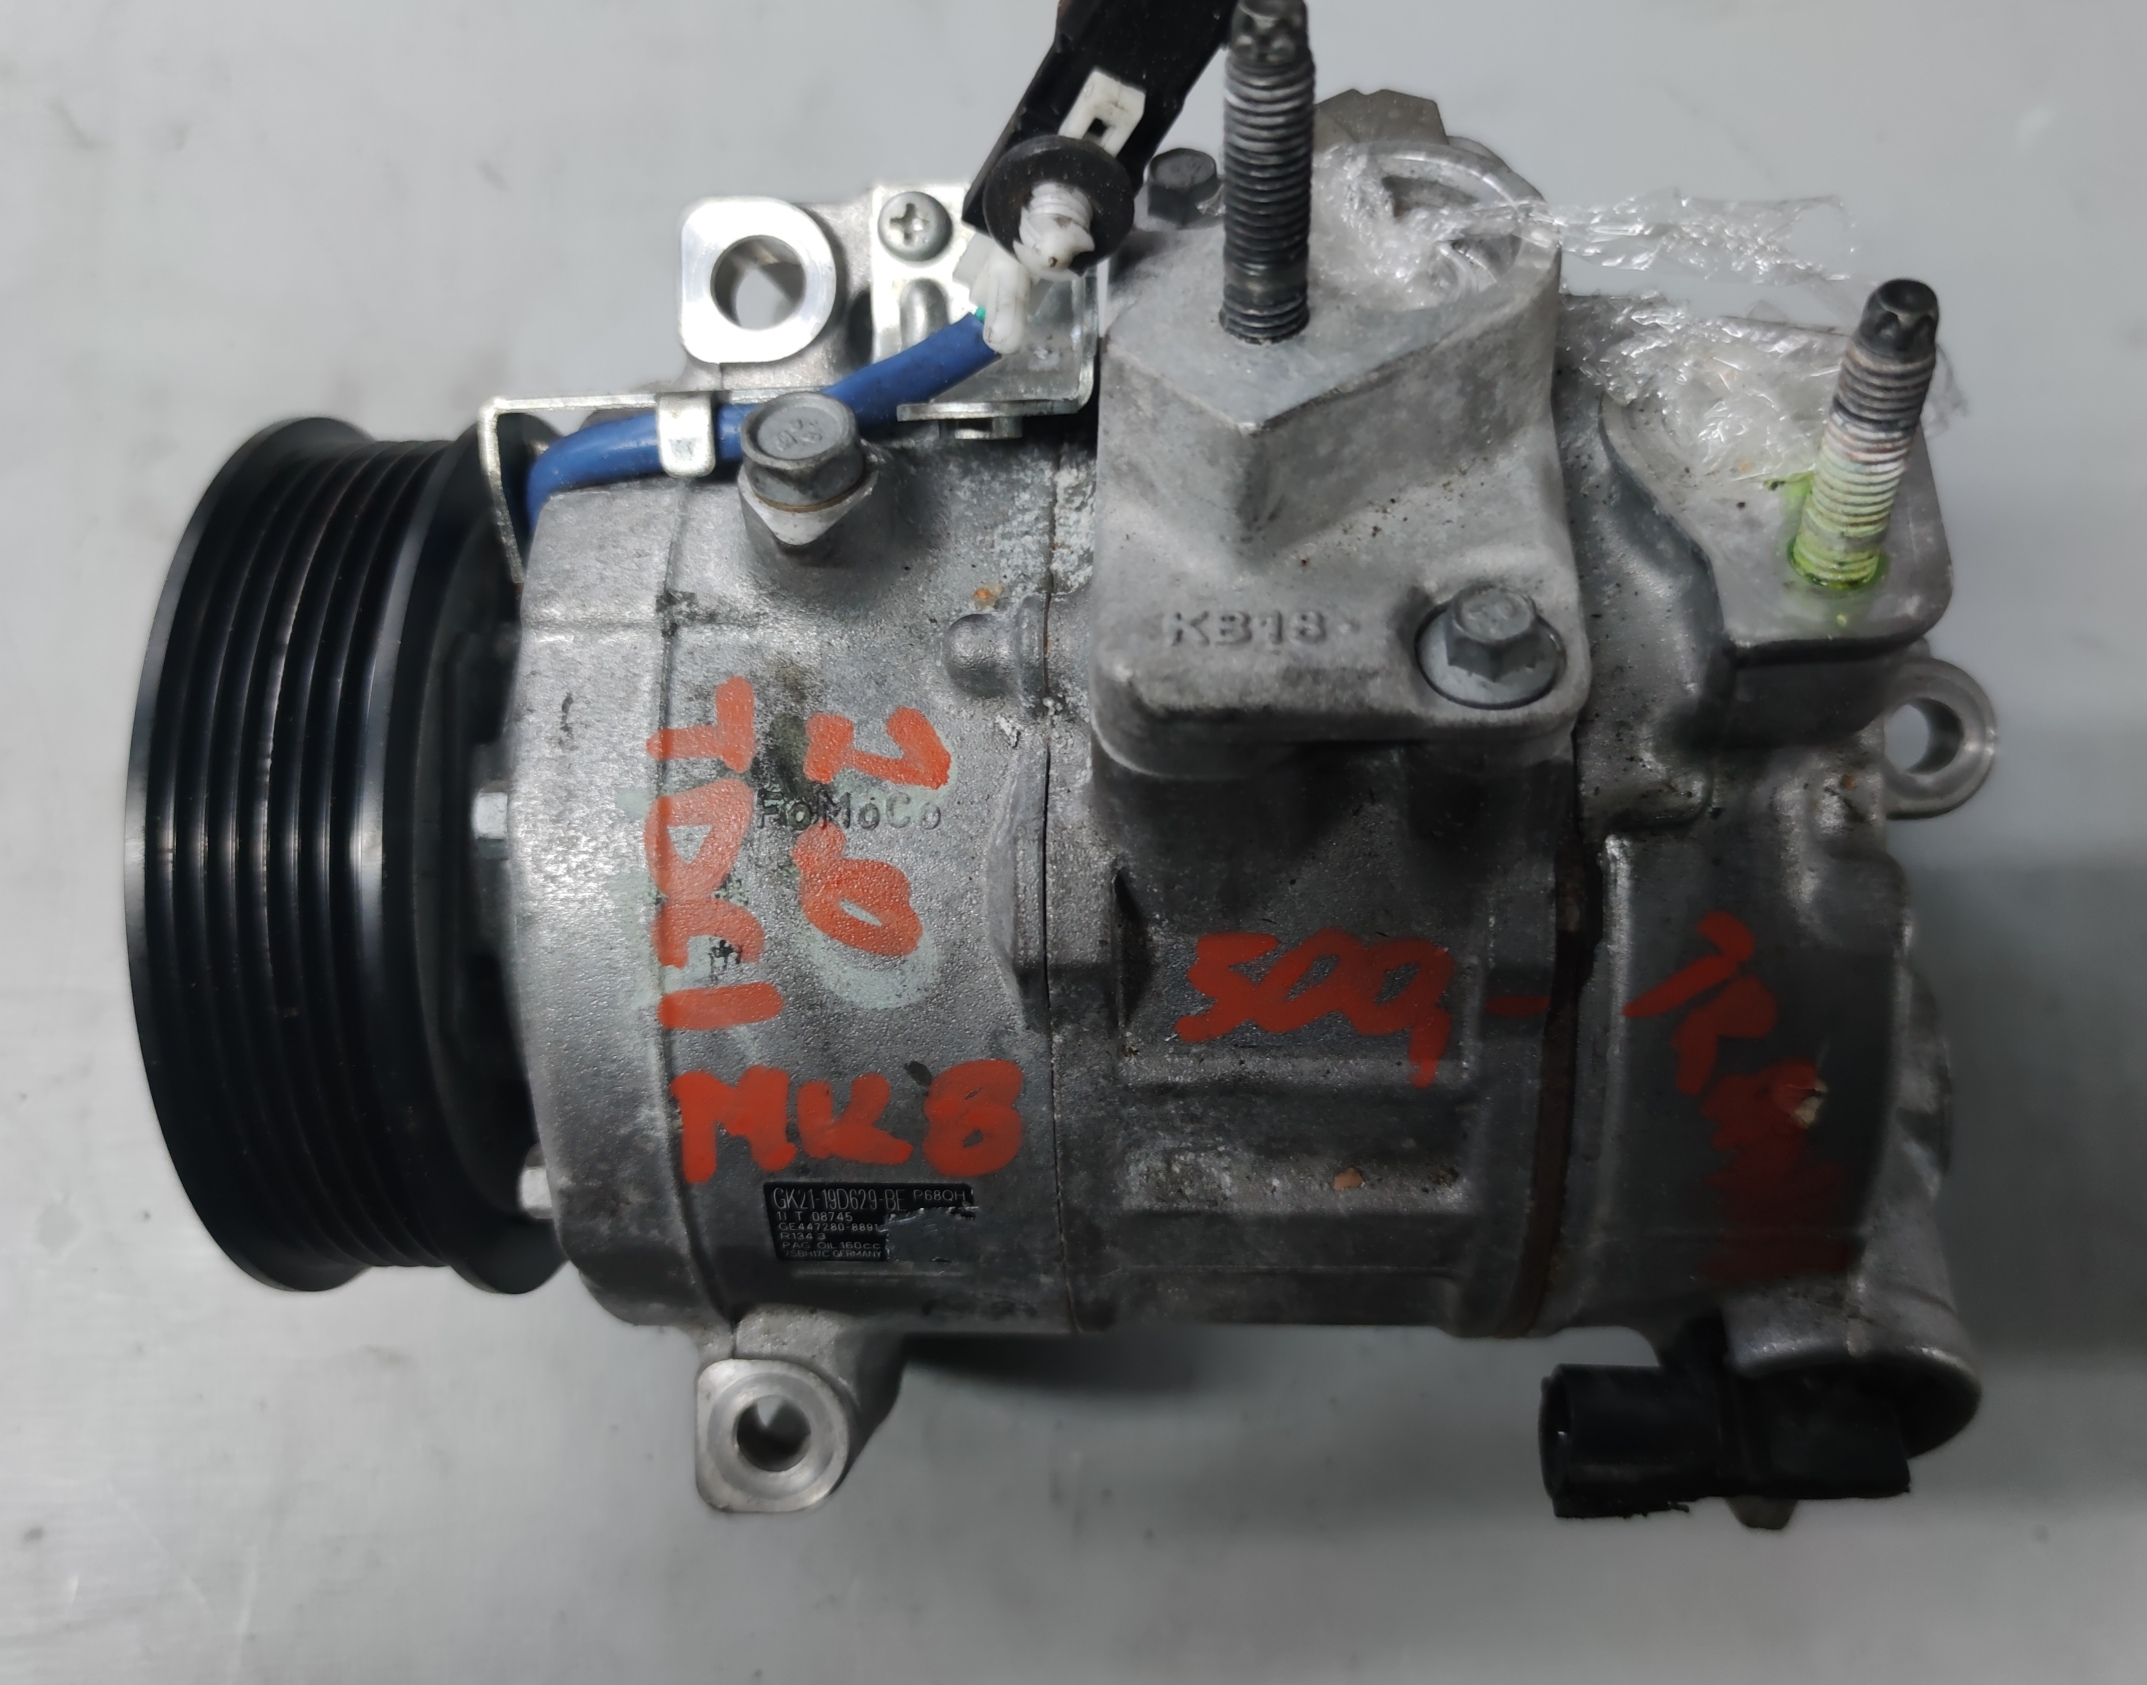 Sprężarka Klimatyzacji Ford 2.0 TDCI gk21-19d629-be